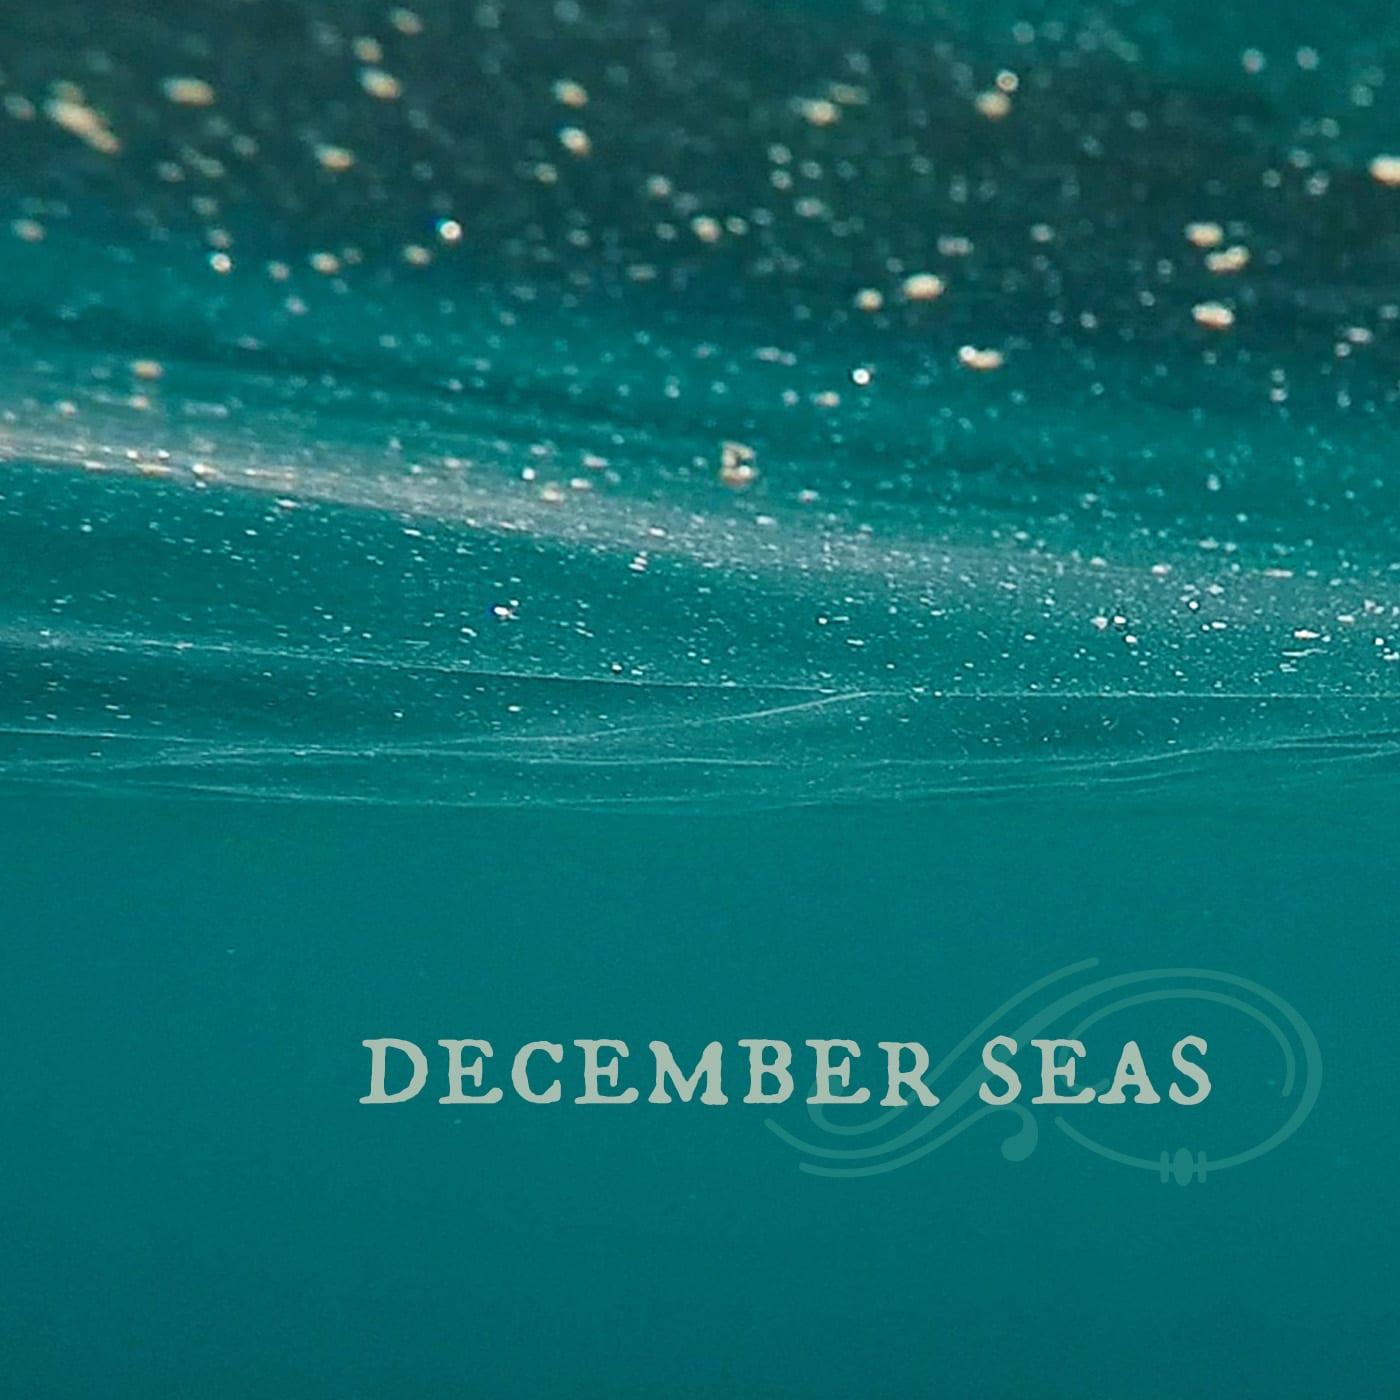 December Seas